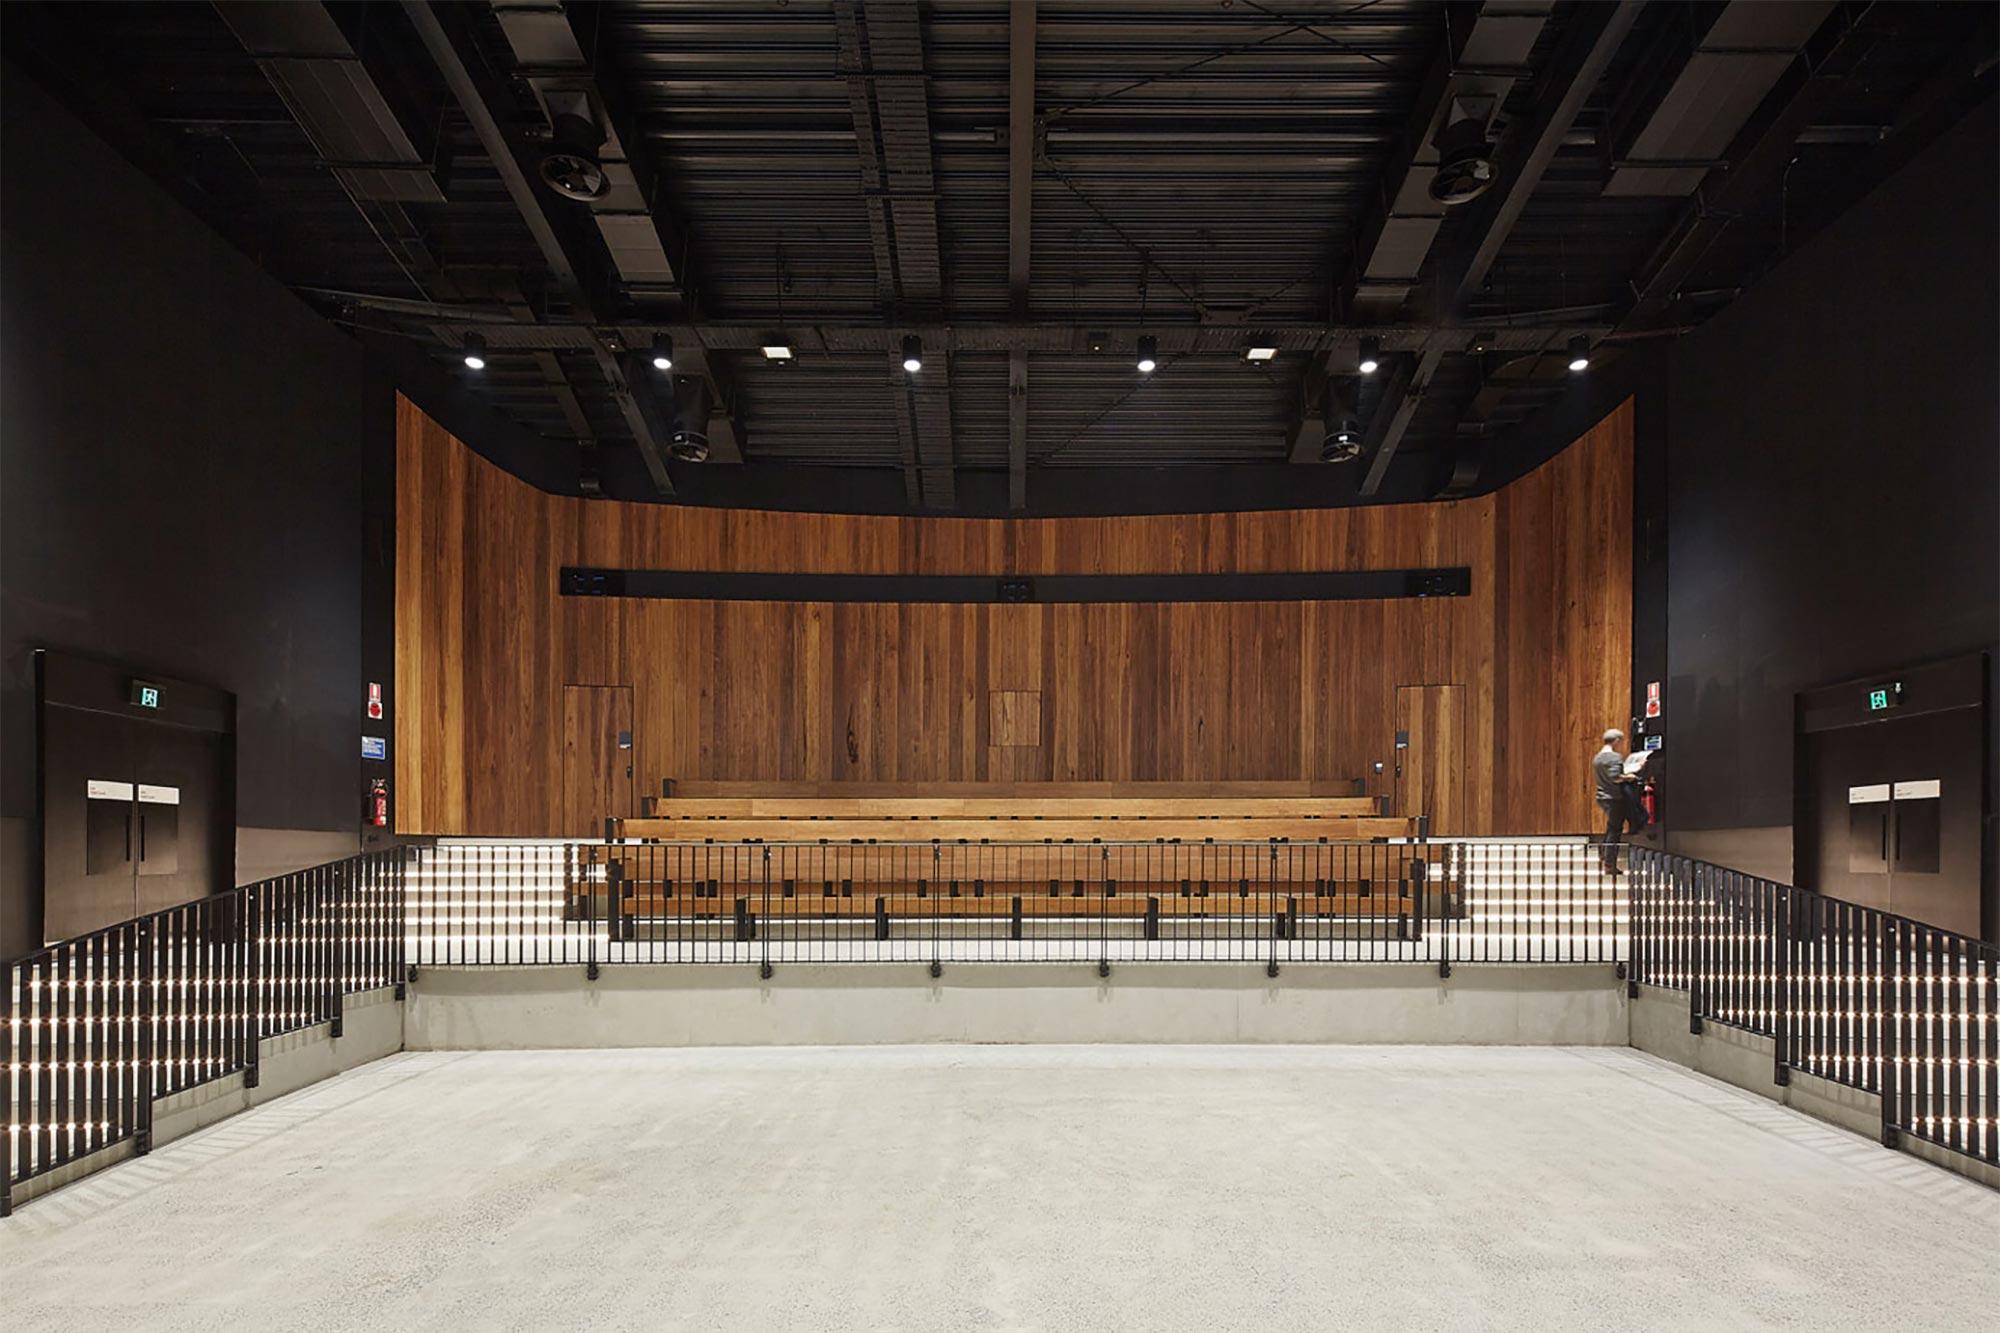 Kane tkd taronga theatre 079 2000x1333